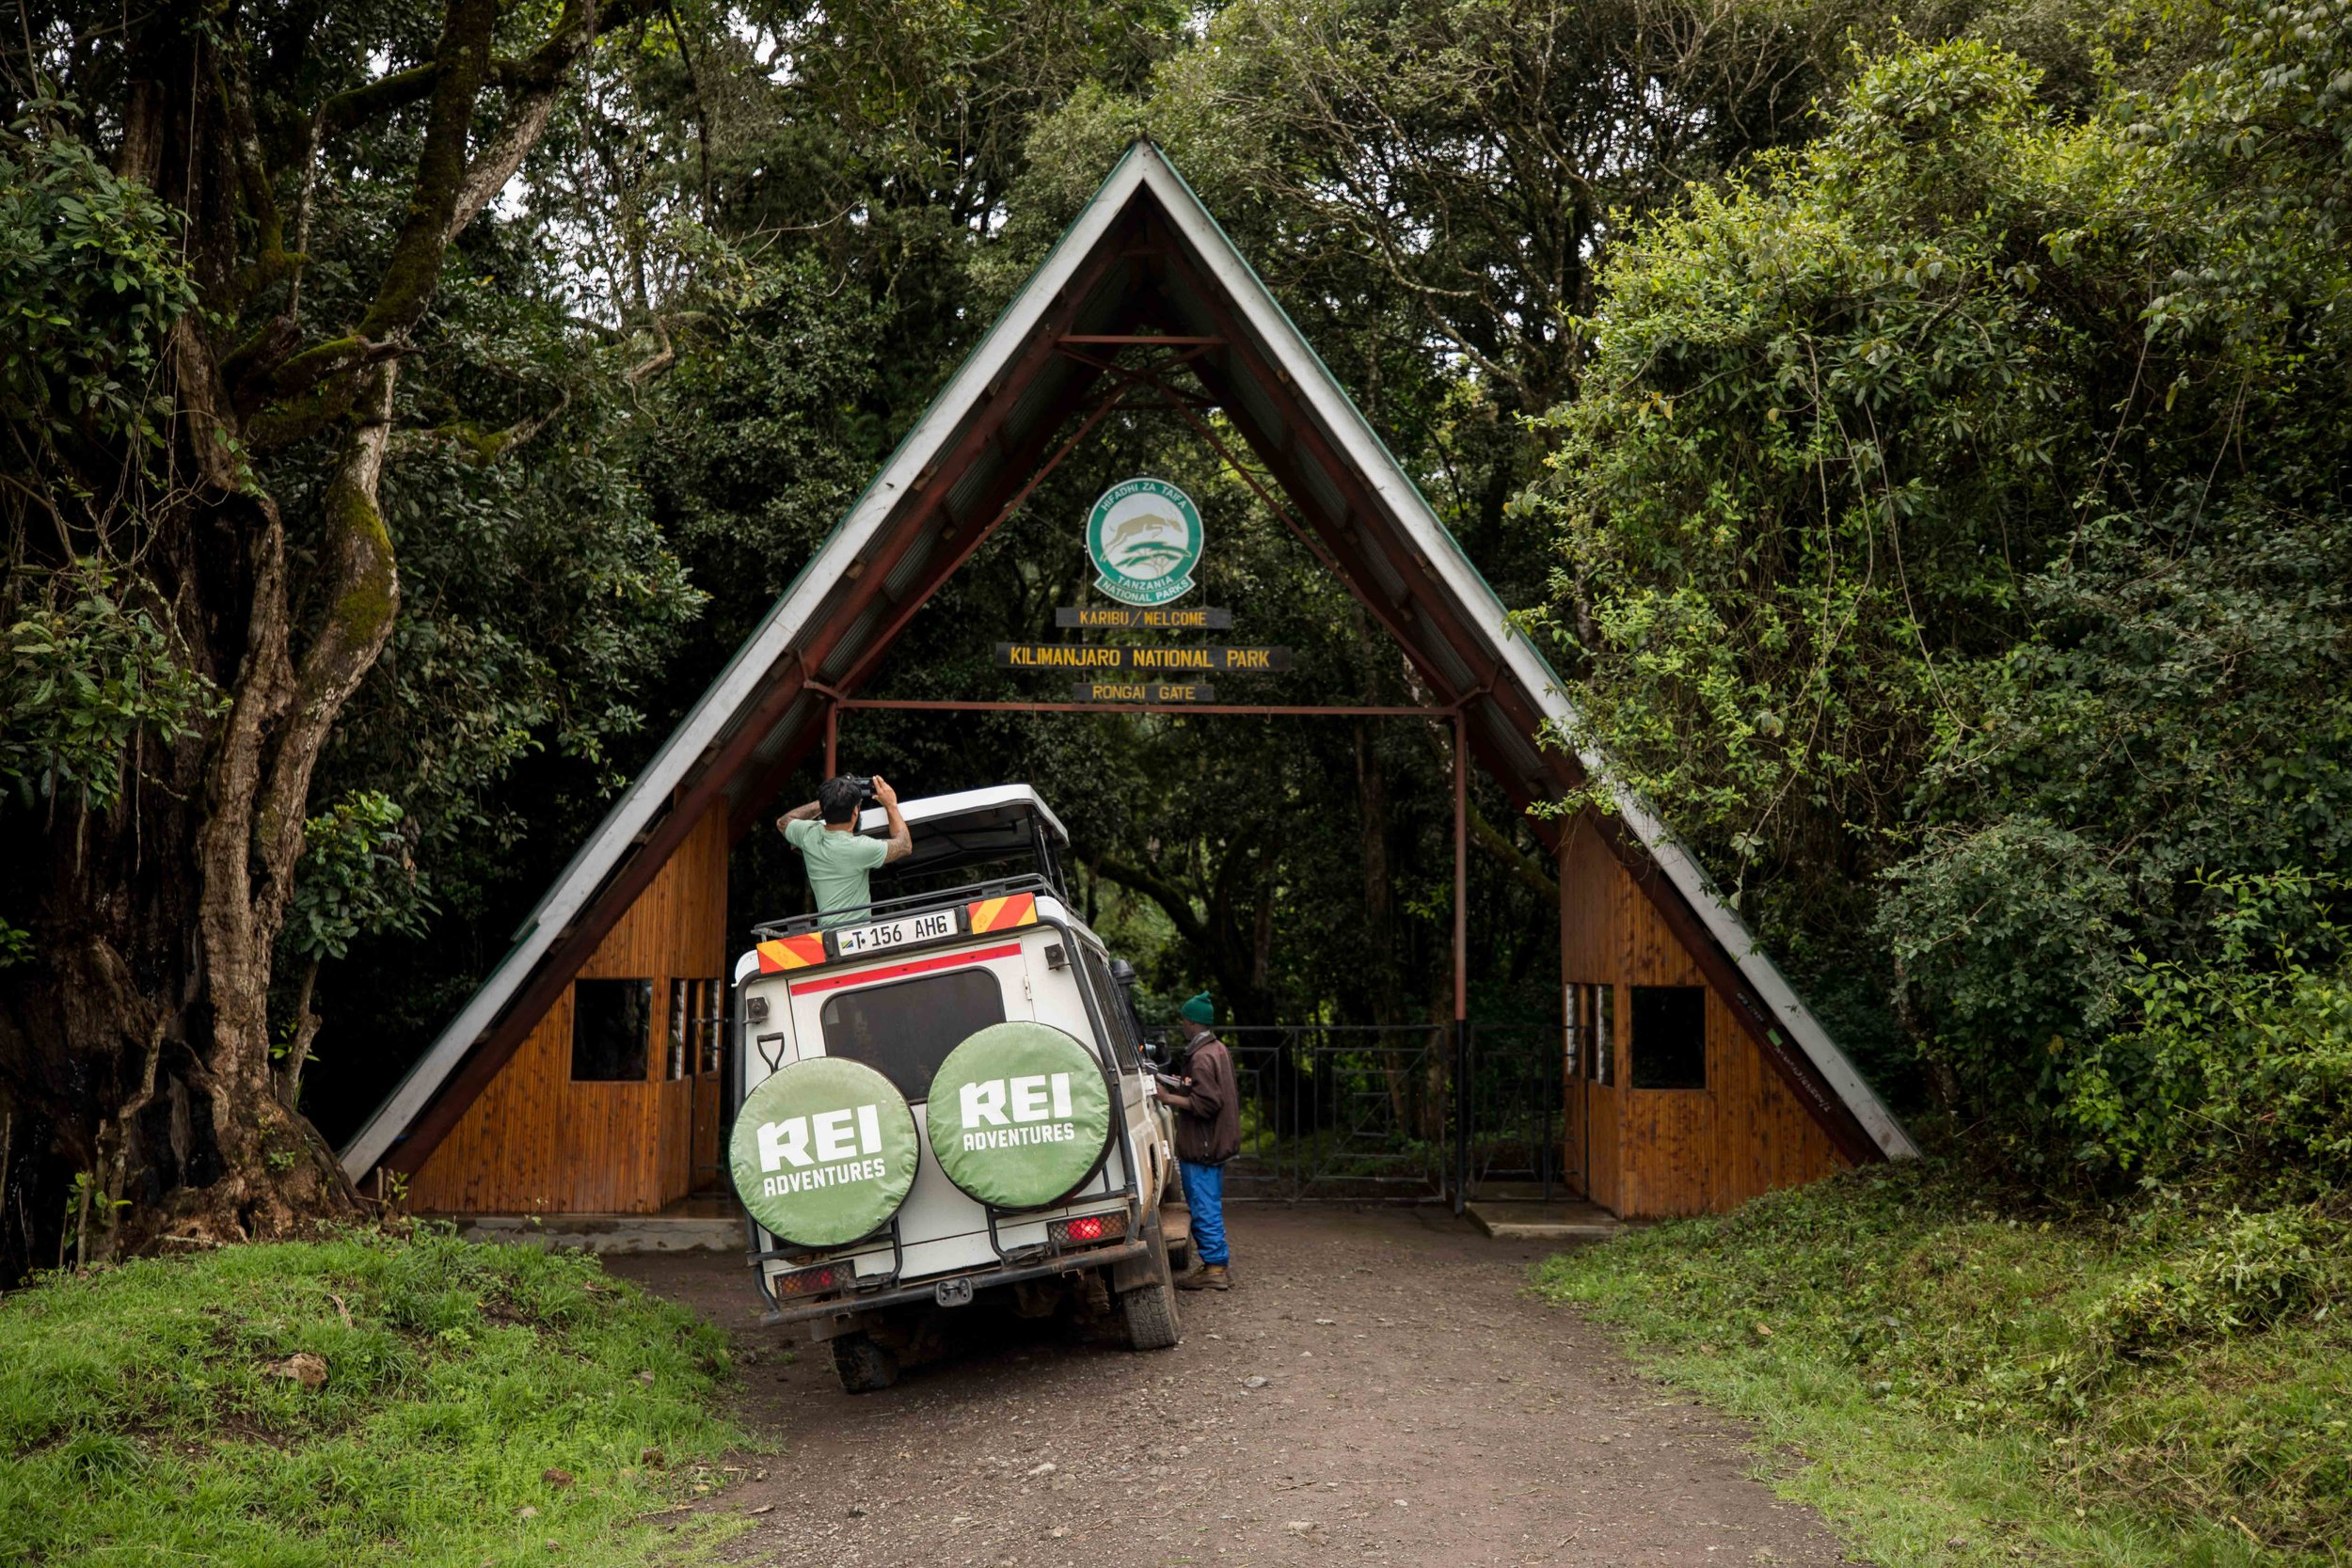 ajw_REI_Kilimanjaro-2-2.jpg